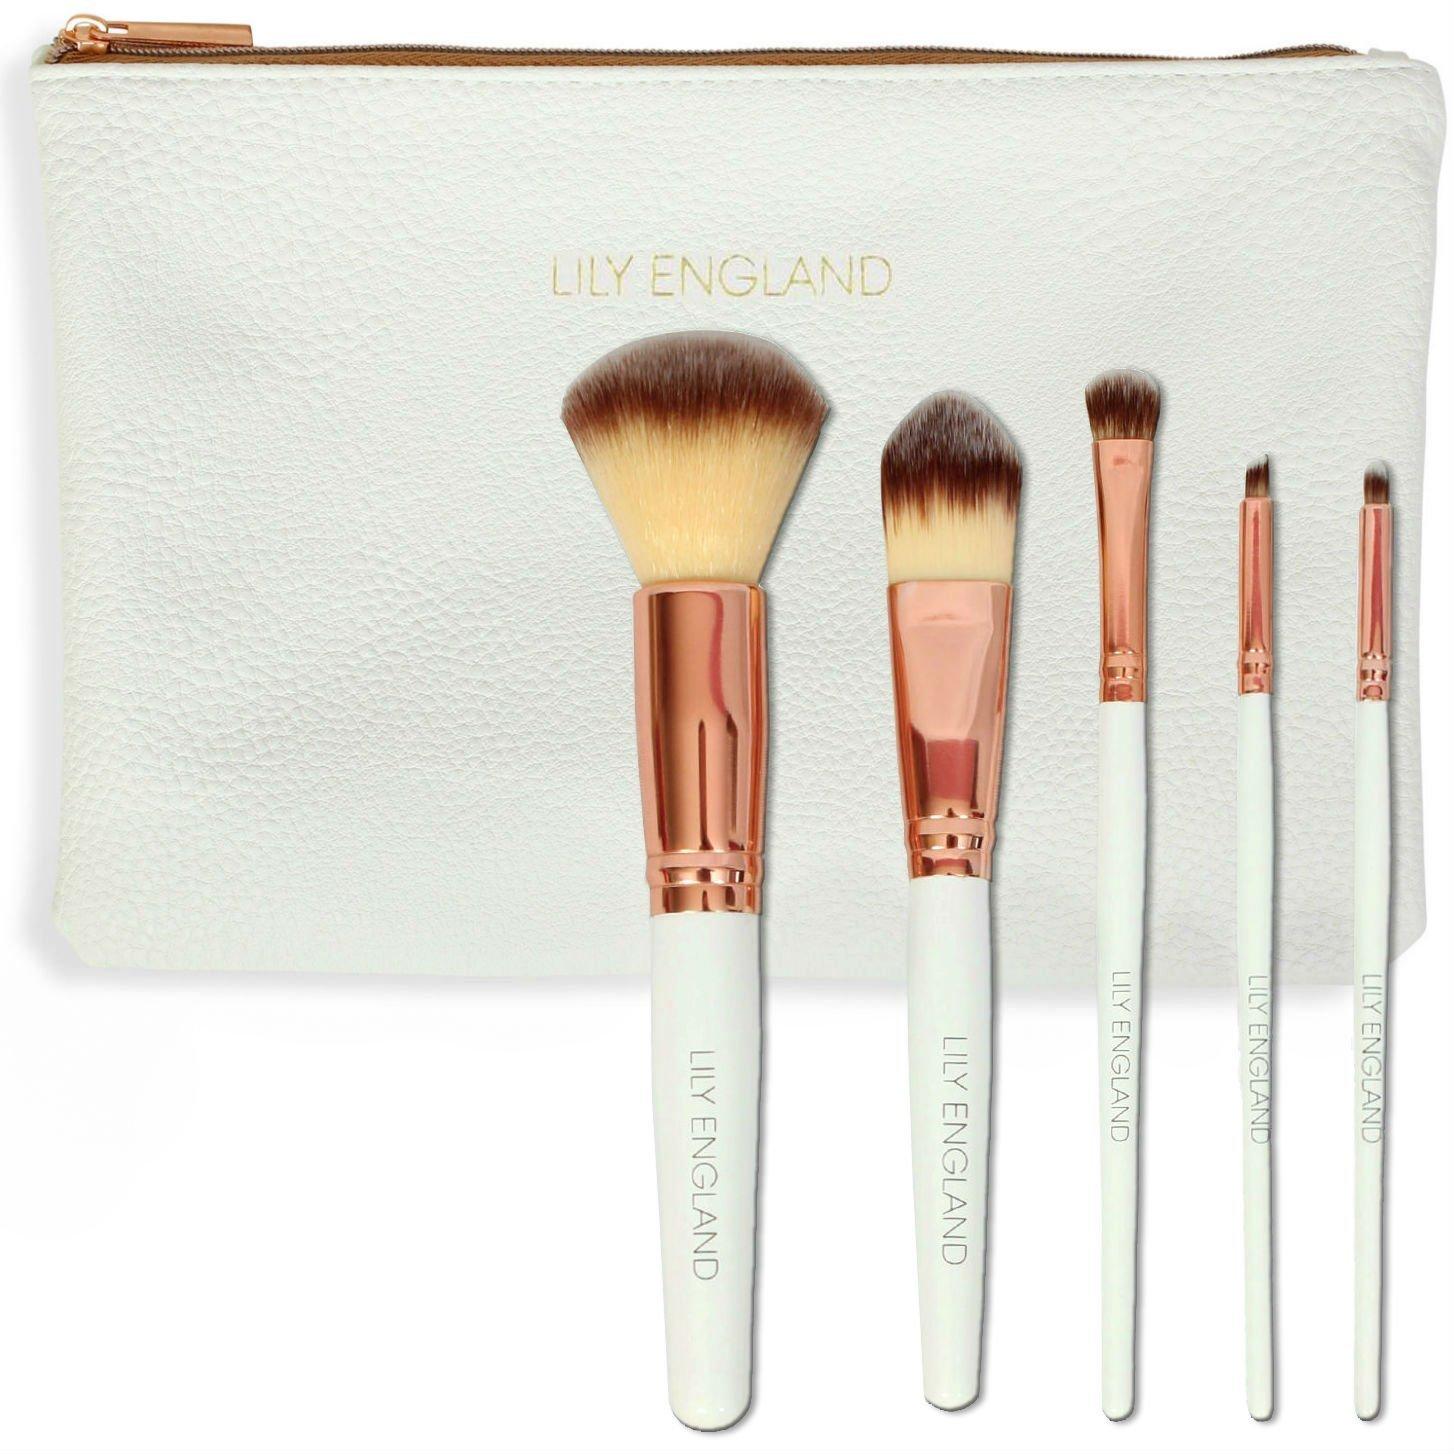 Lily England Rose Gold Makeup Brush Set with 5 Brushes and Makeup Bag